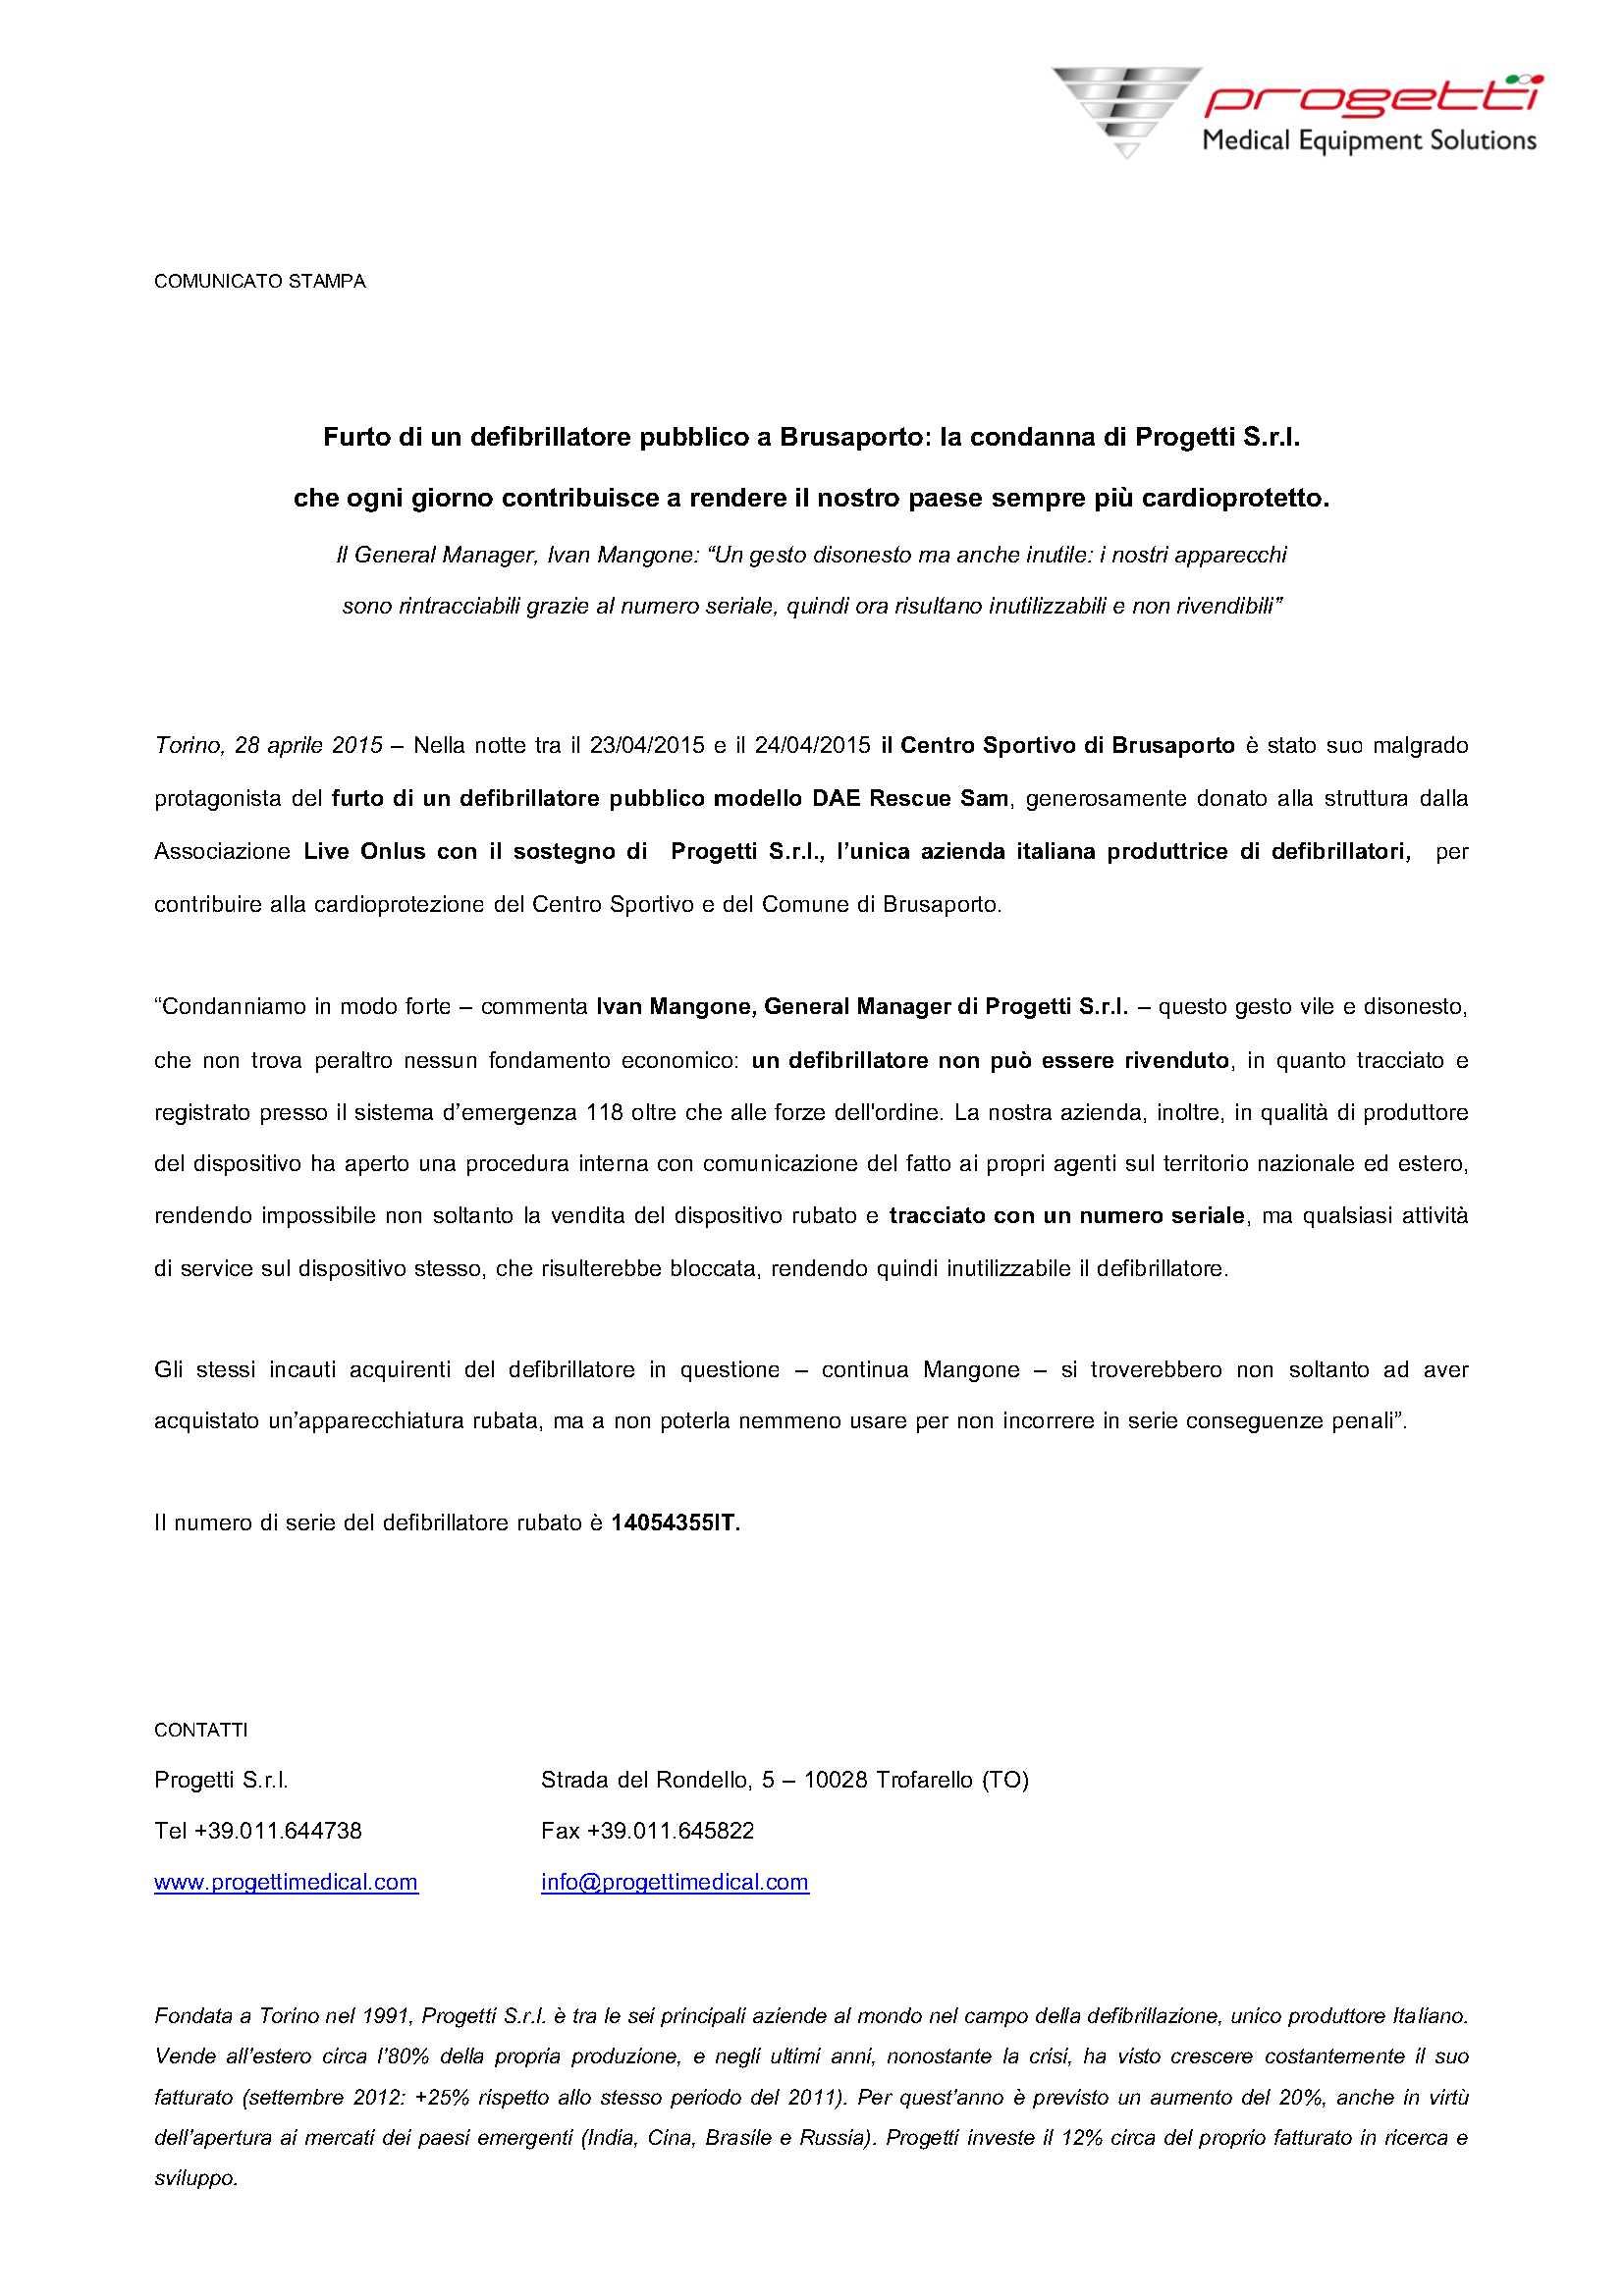 CS_Furto Brusaporto(1)